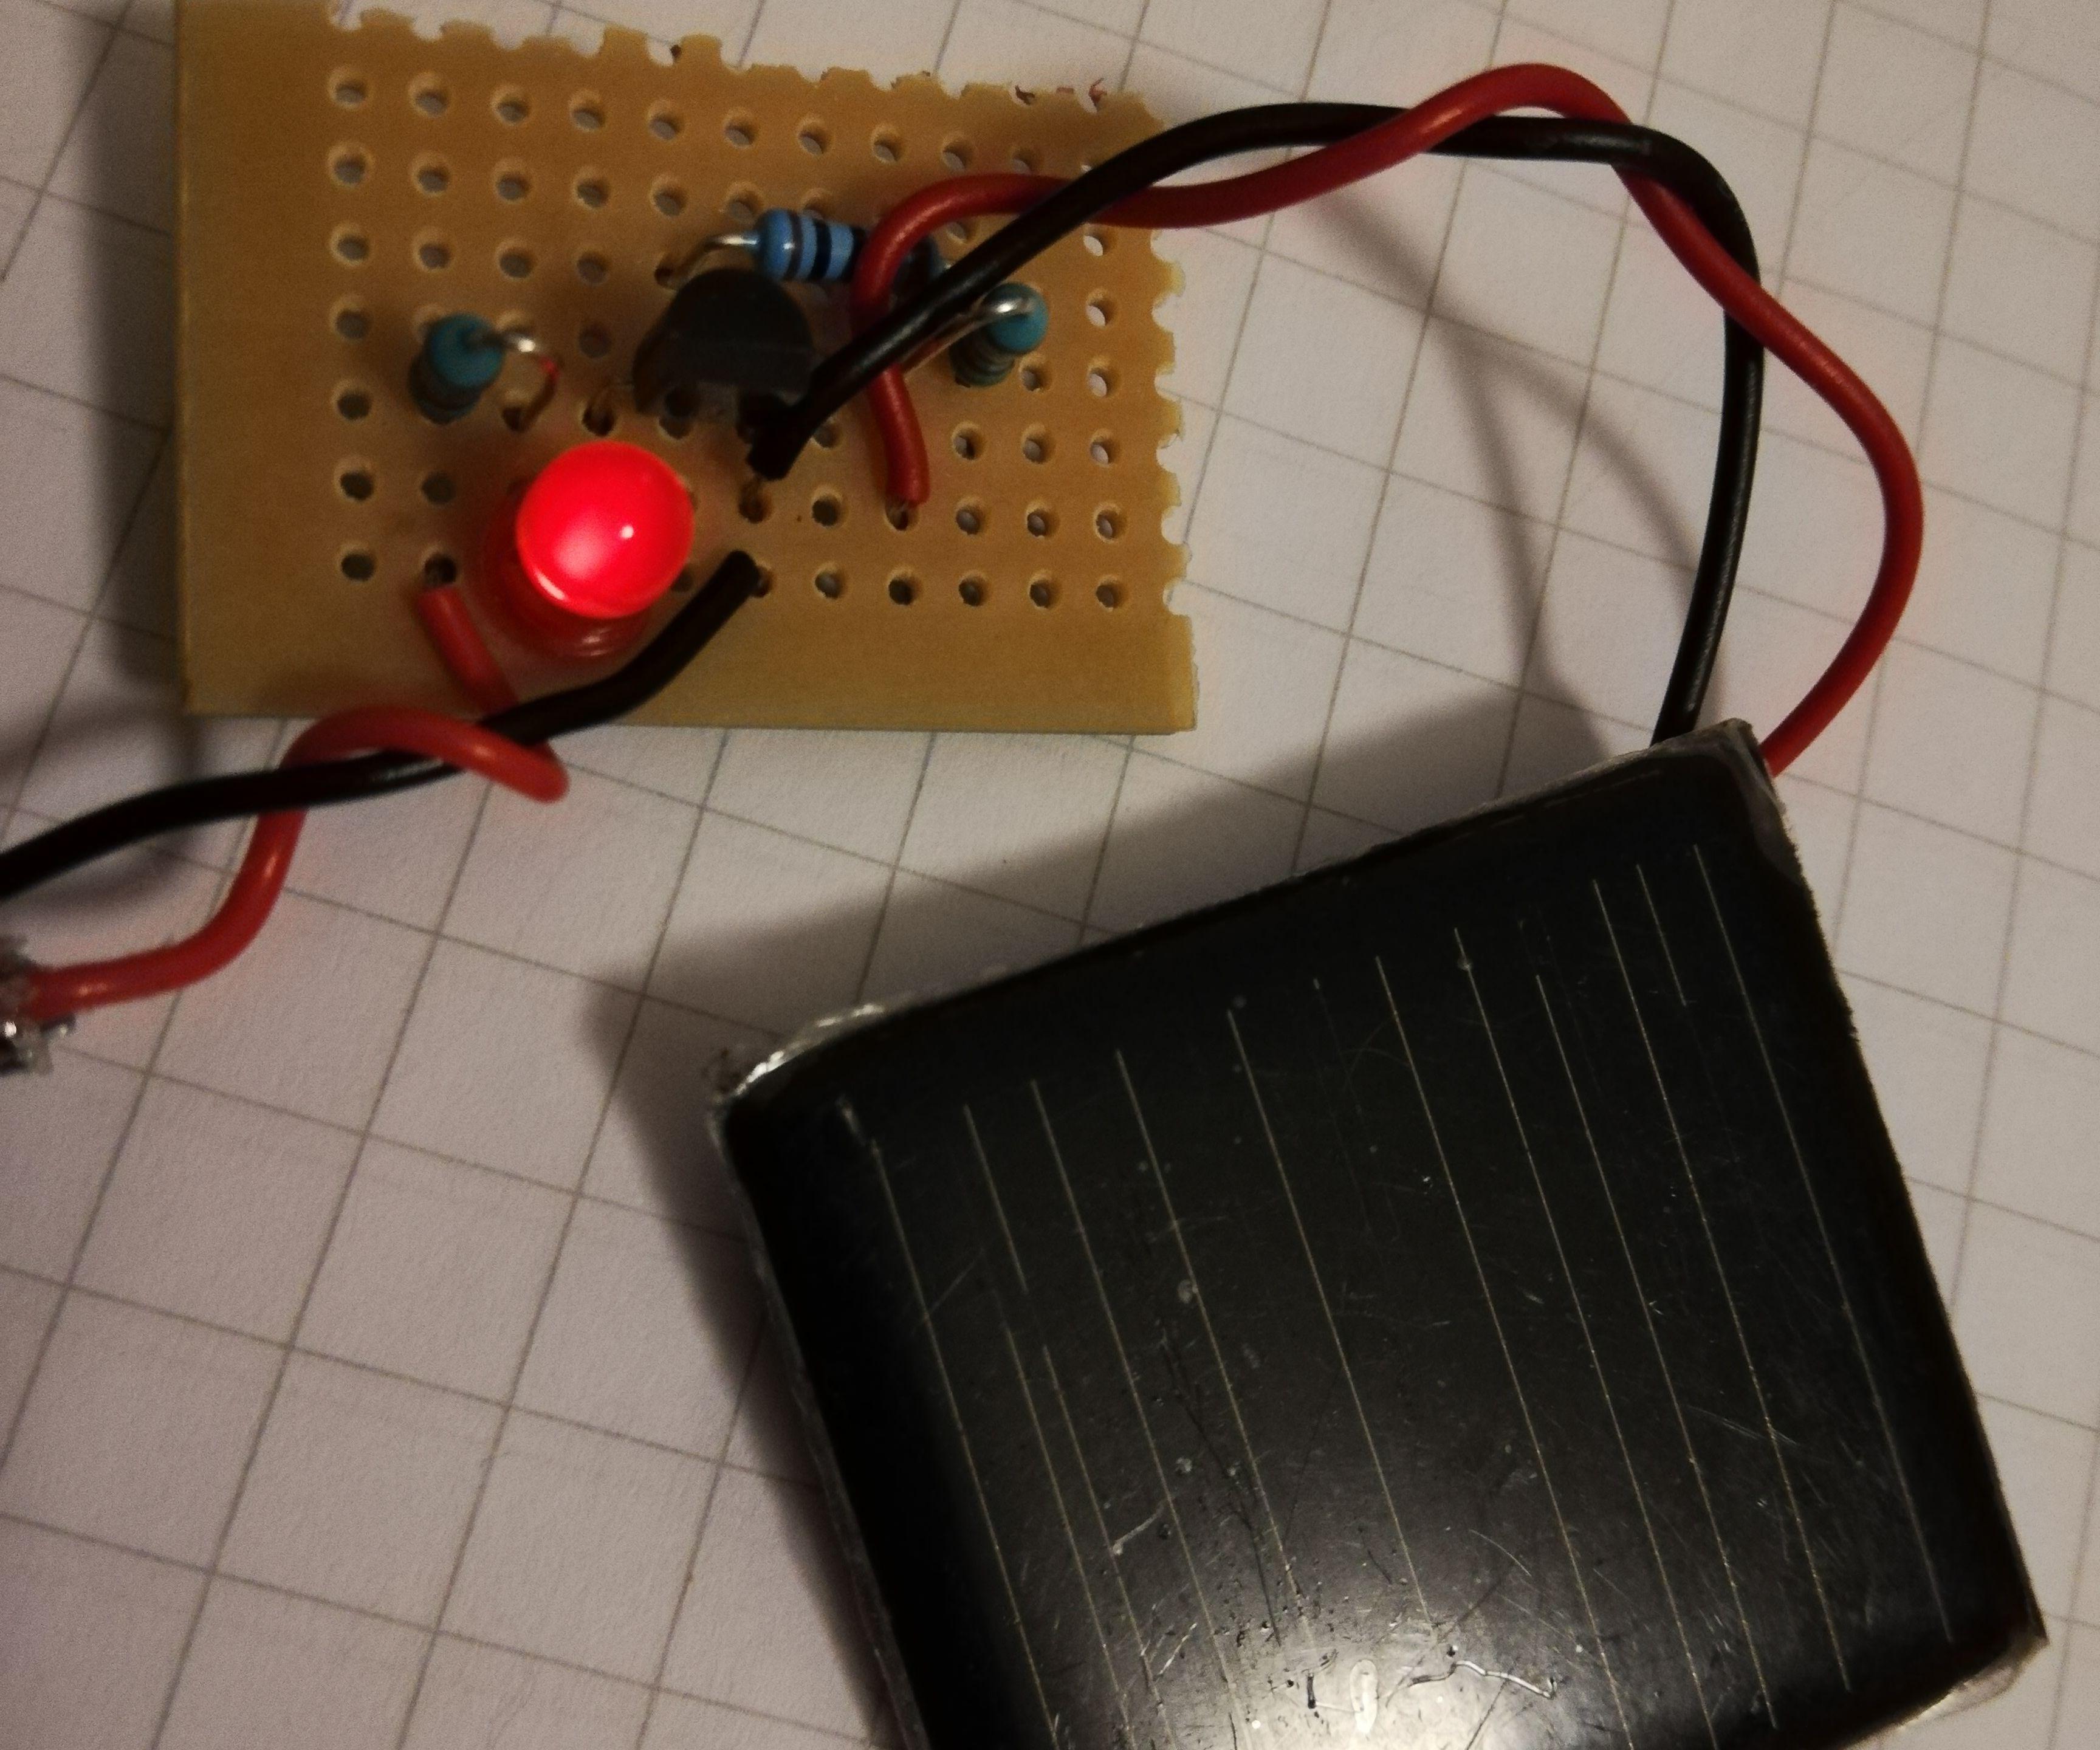 Simple Light Sensor With an LED